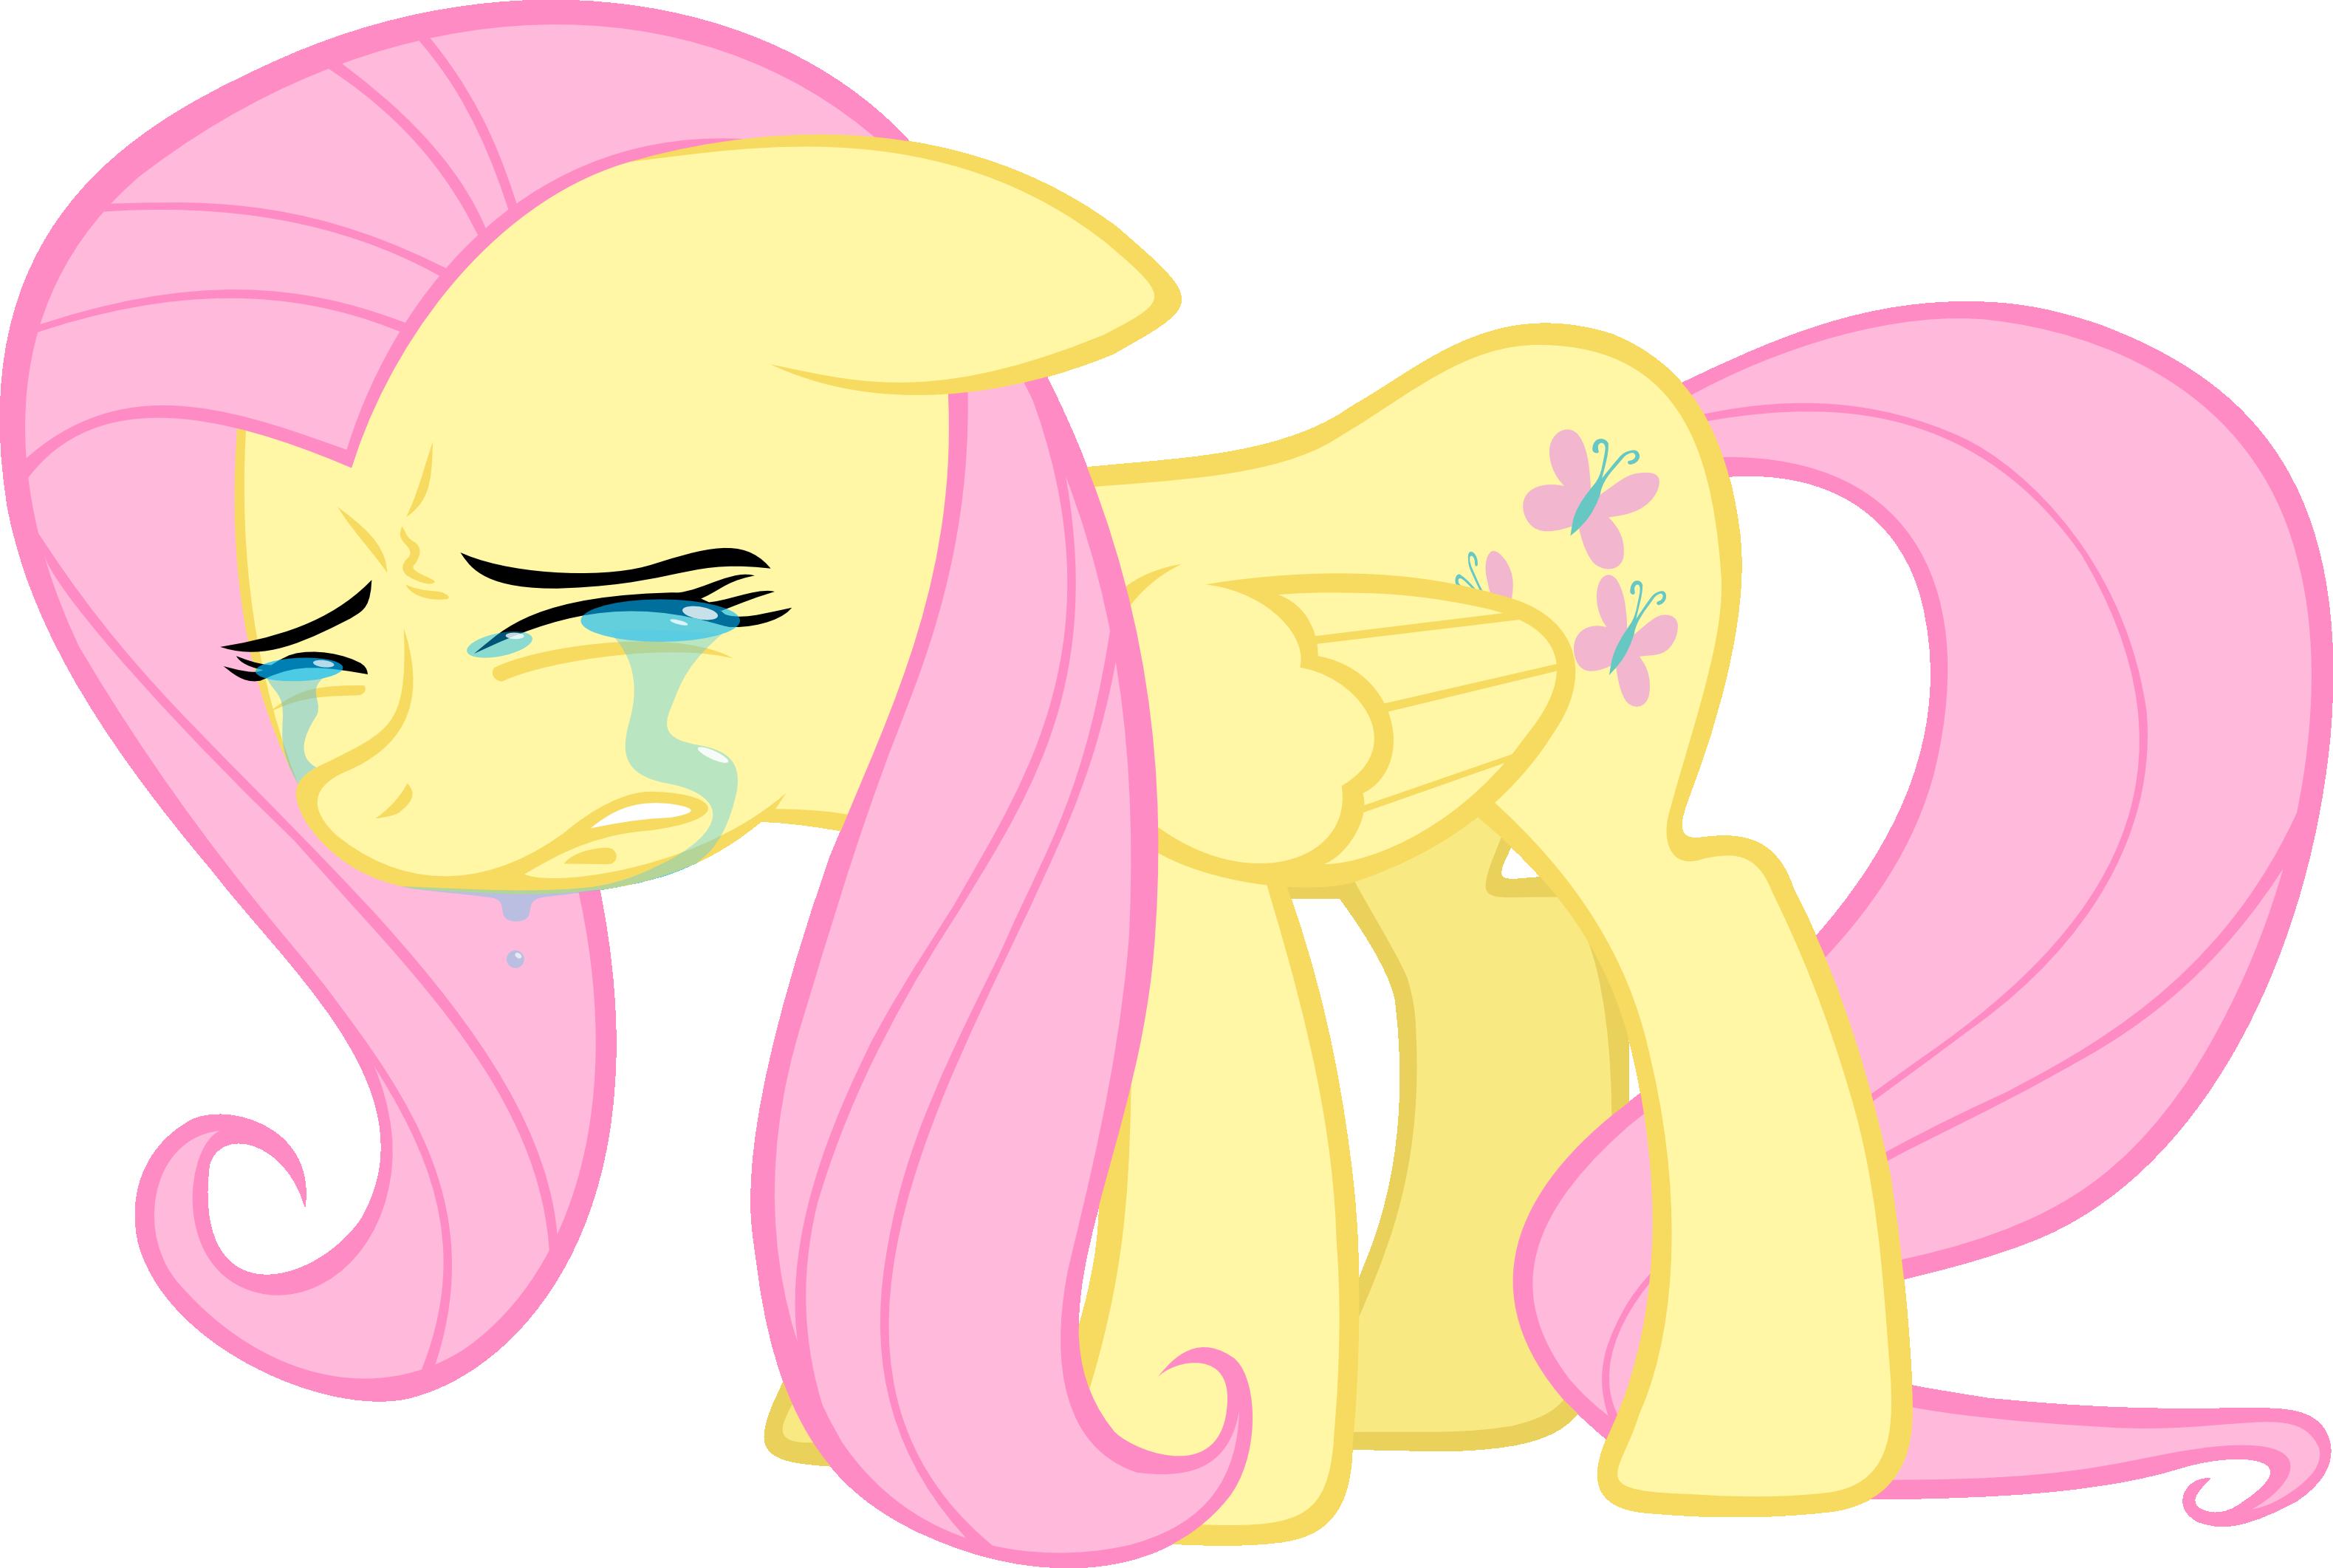 Shy - Broken Heart